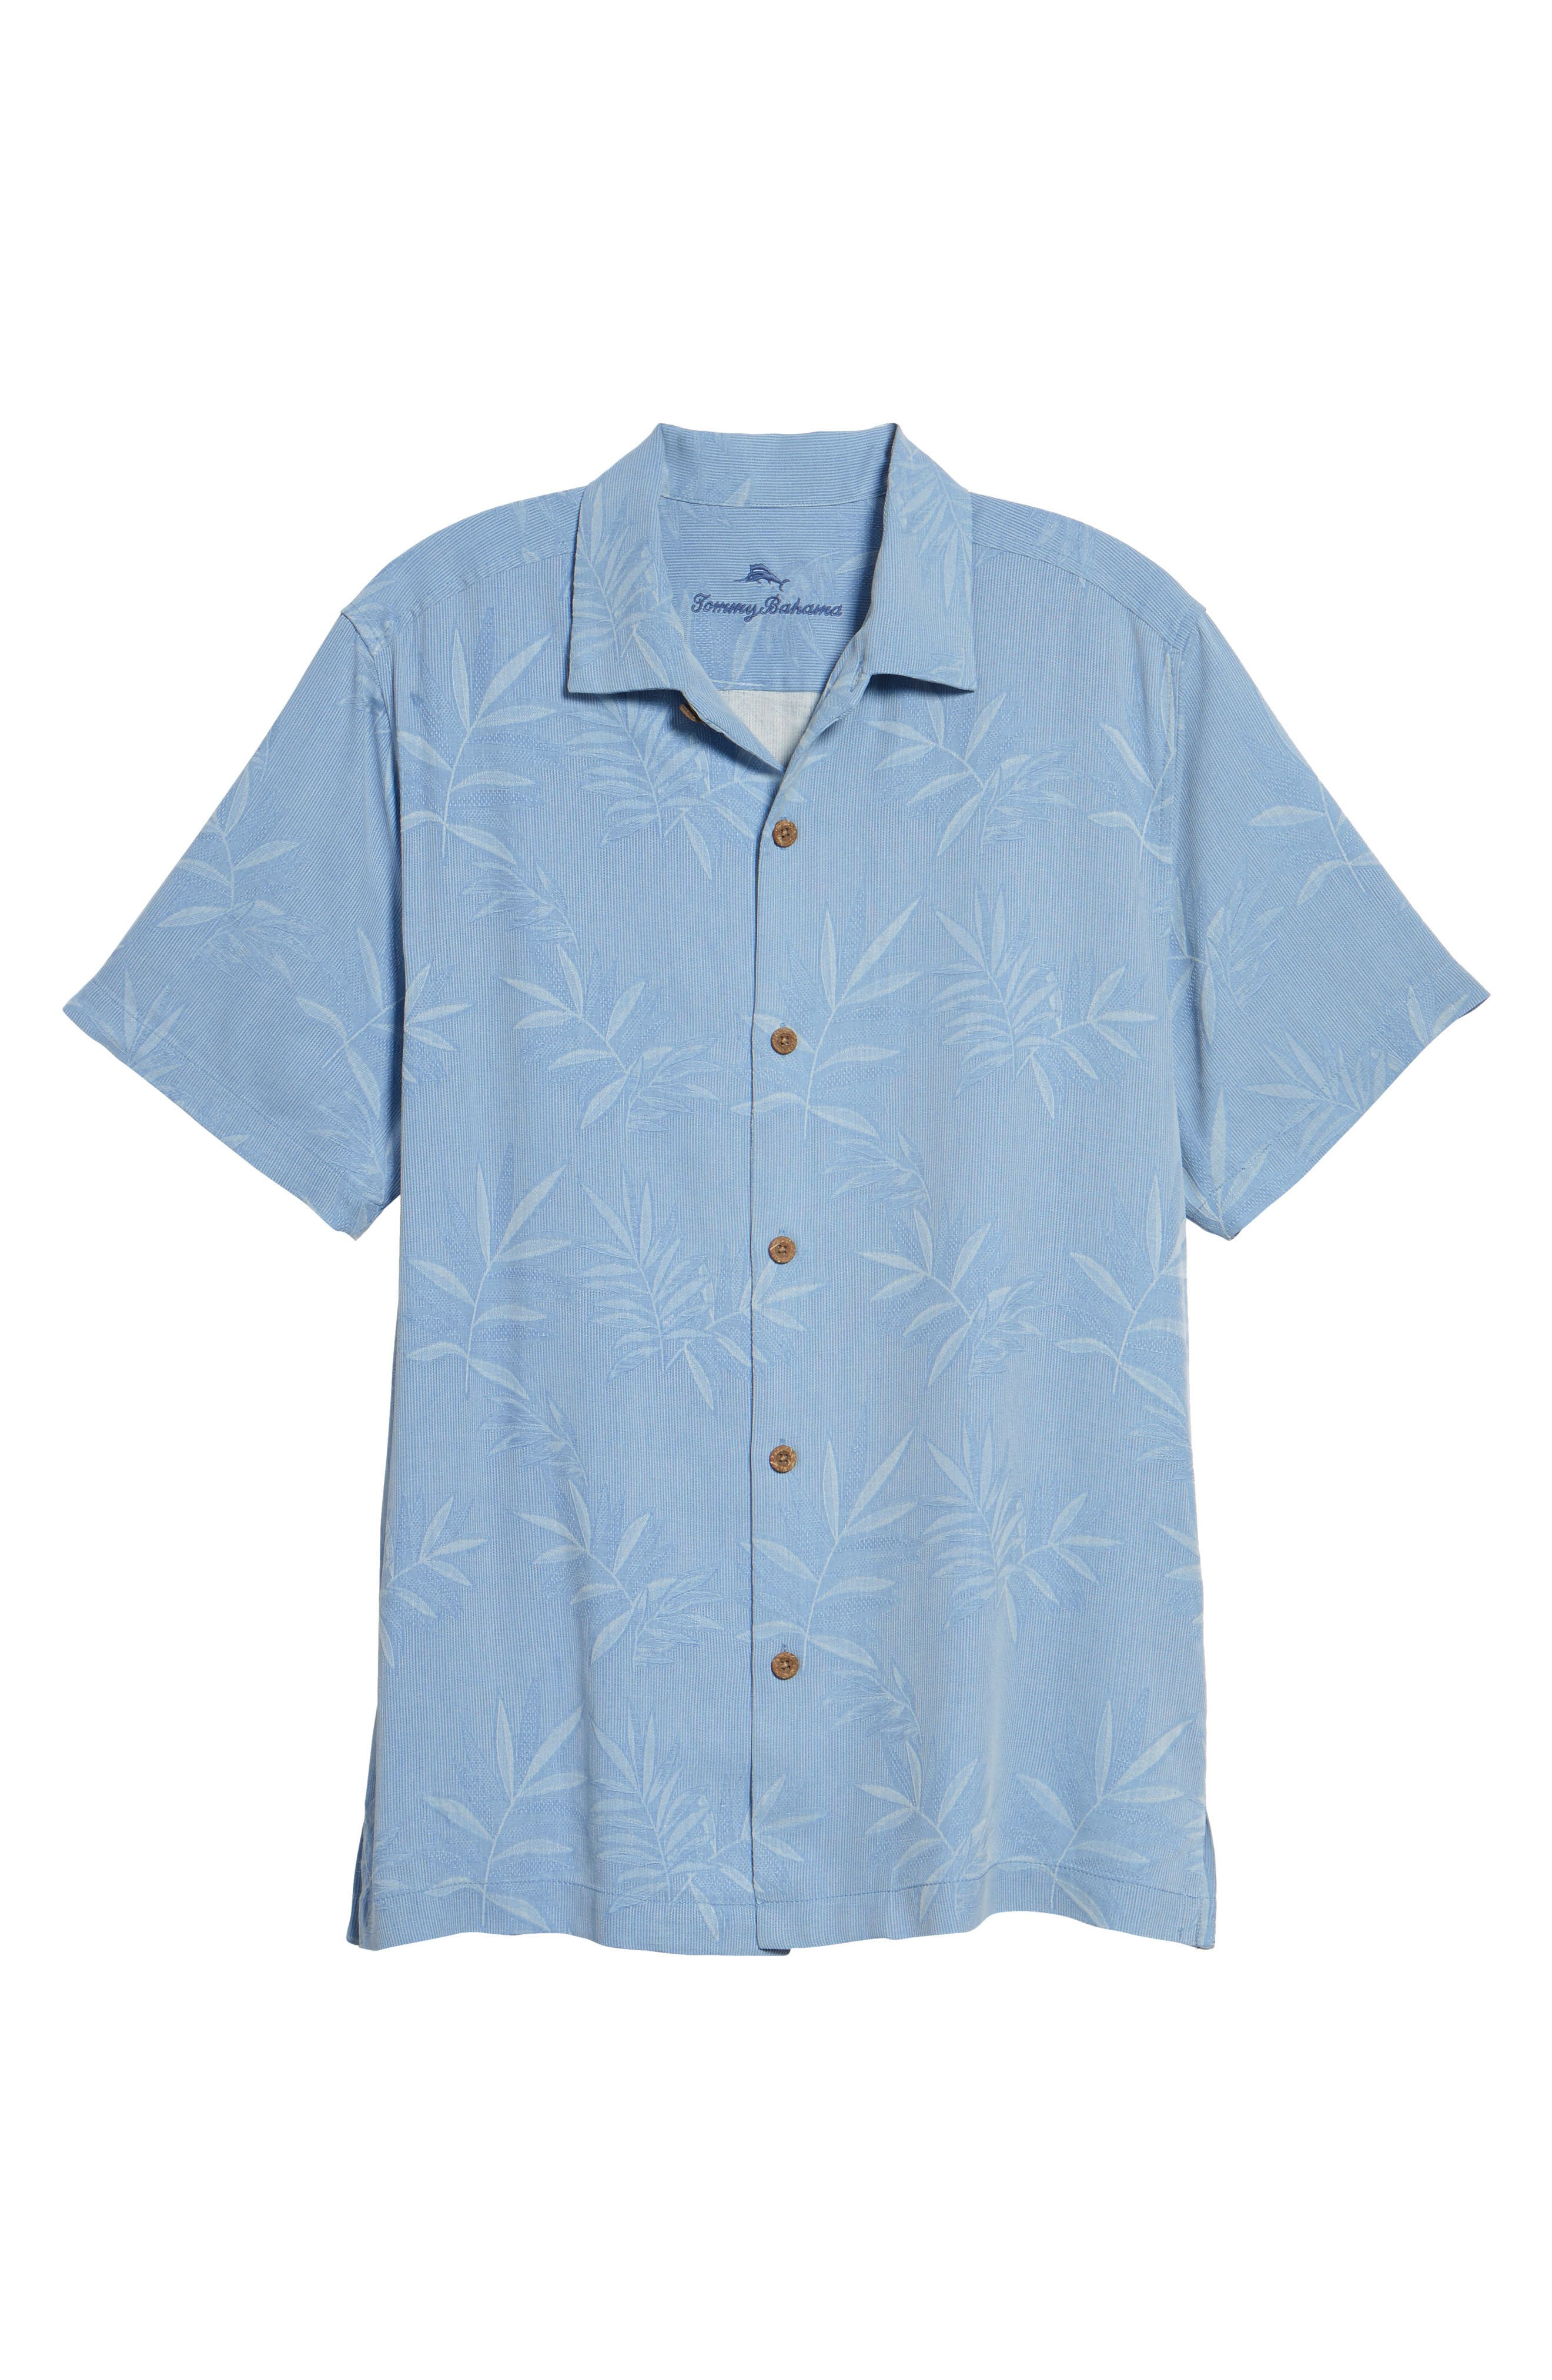 TOMMY BAHAMA,                             Luau Floral Silk Shirt,                             Alternate thumbnail 6, color,                             408